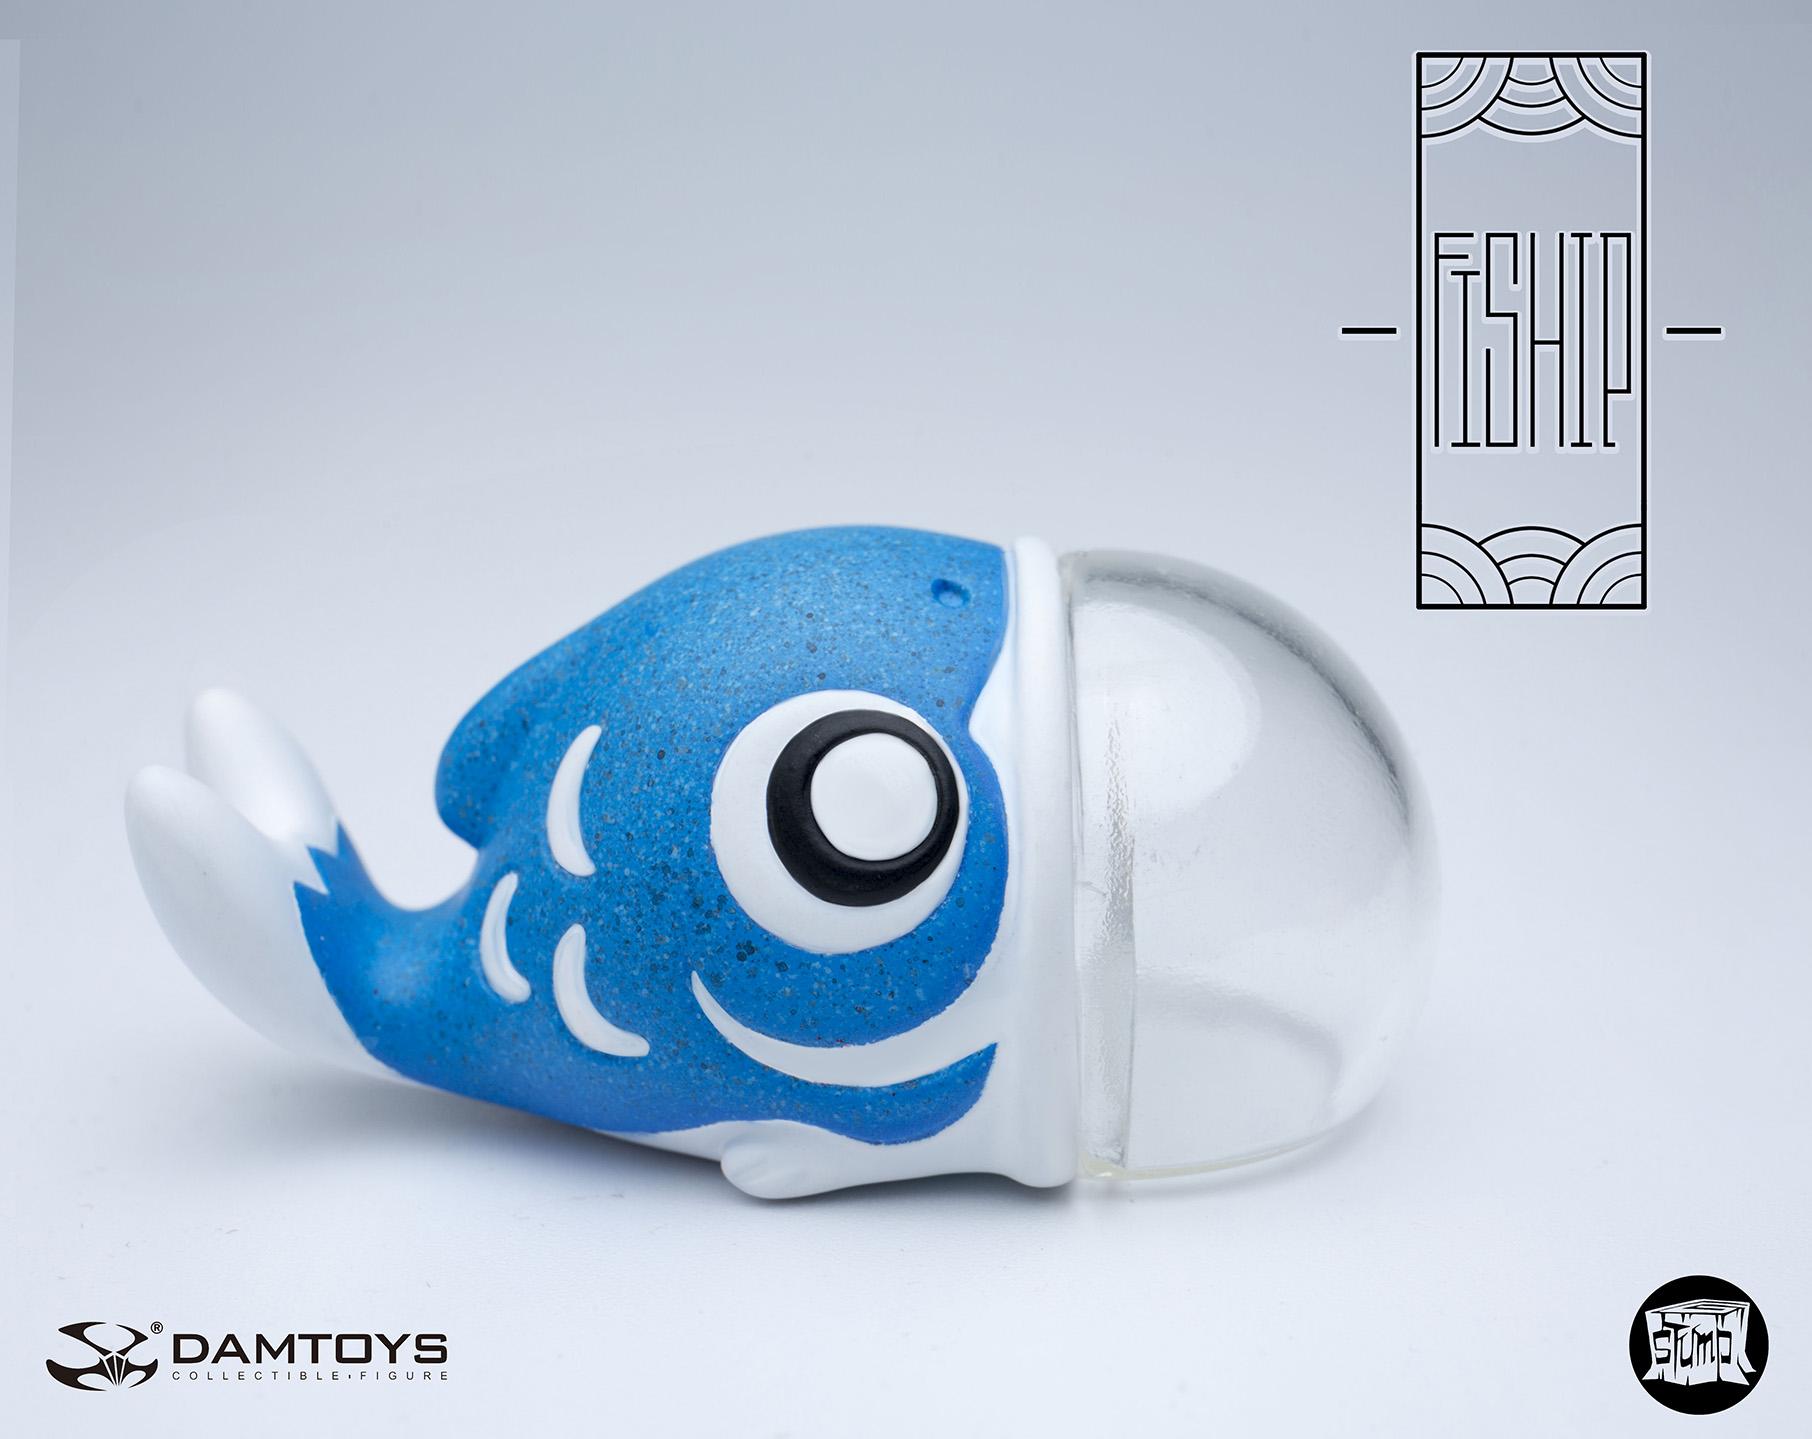 fiship 9.jpg